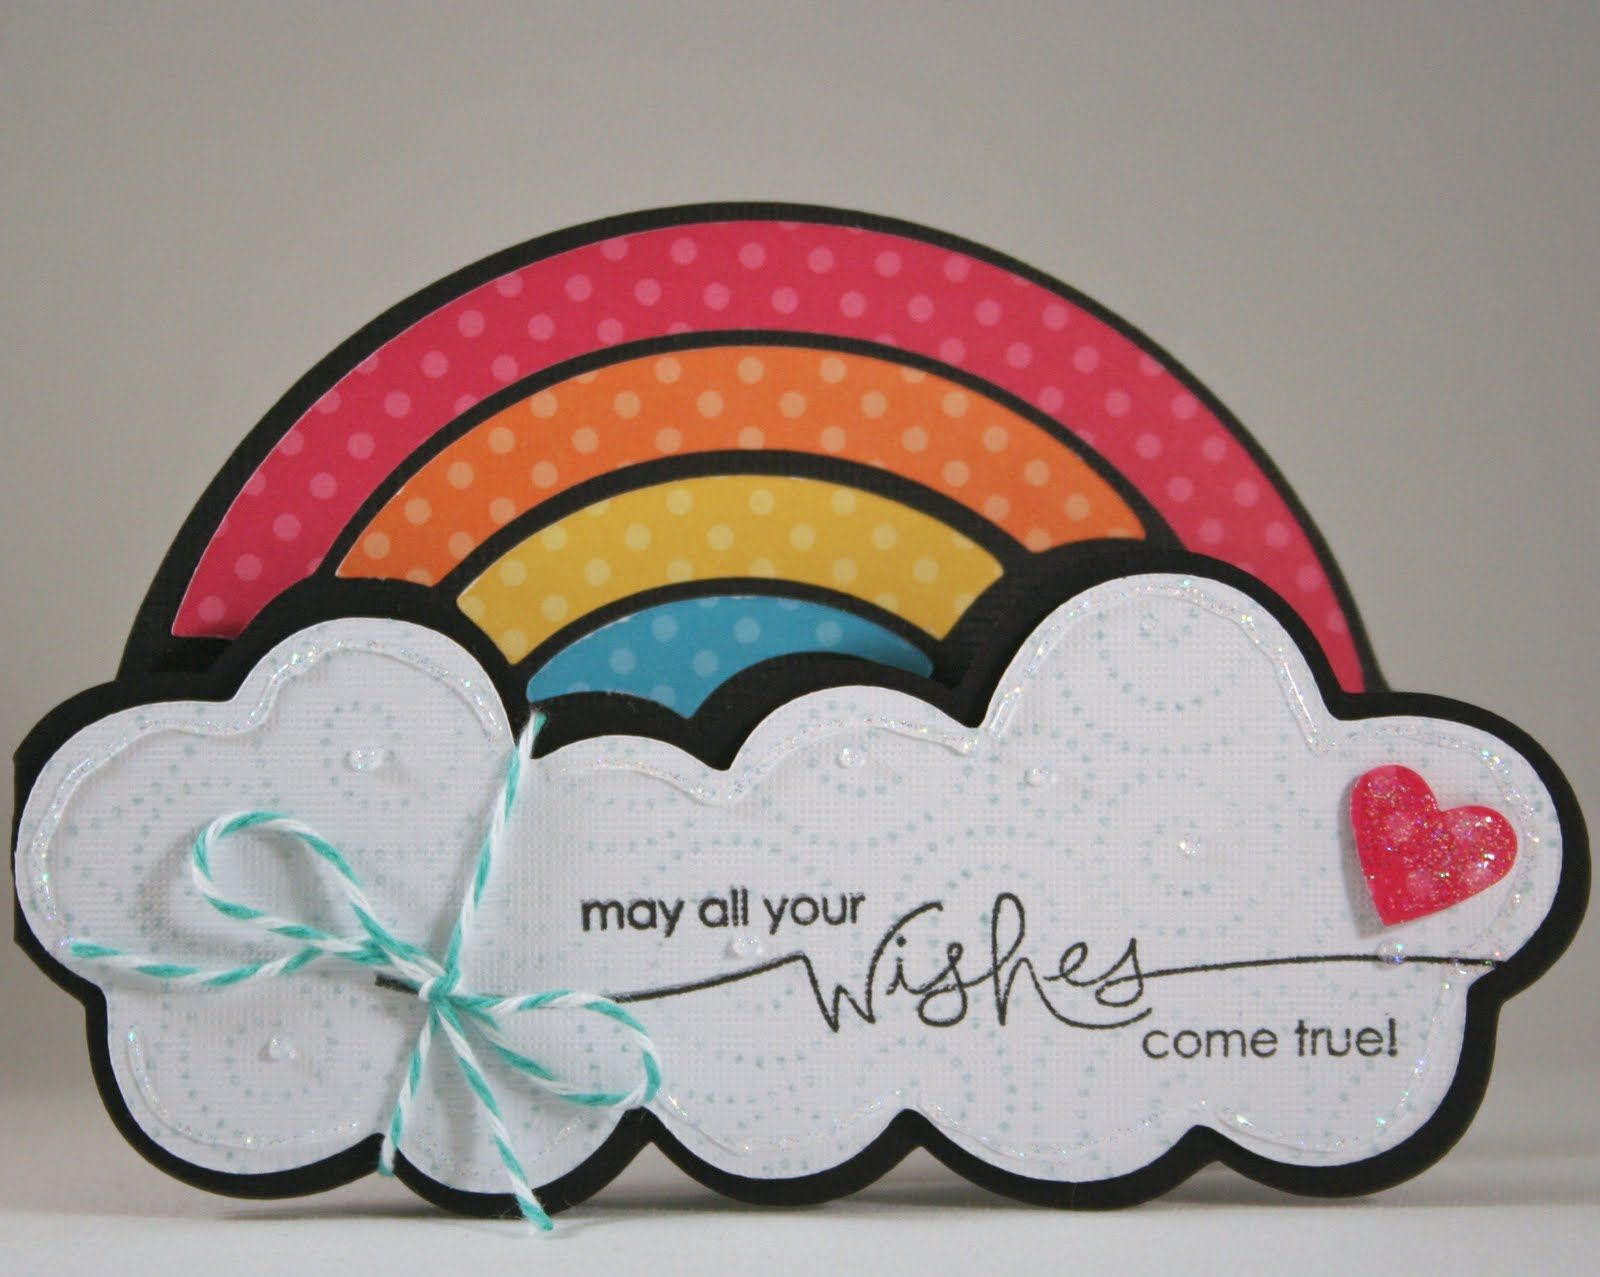 Scrapbook ideas hello kitty - Hello Kitty Greetings Cricut Cartridge Rainbow And Cloud Card